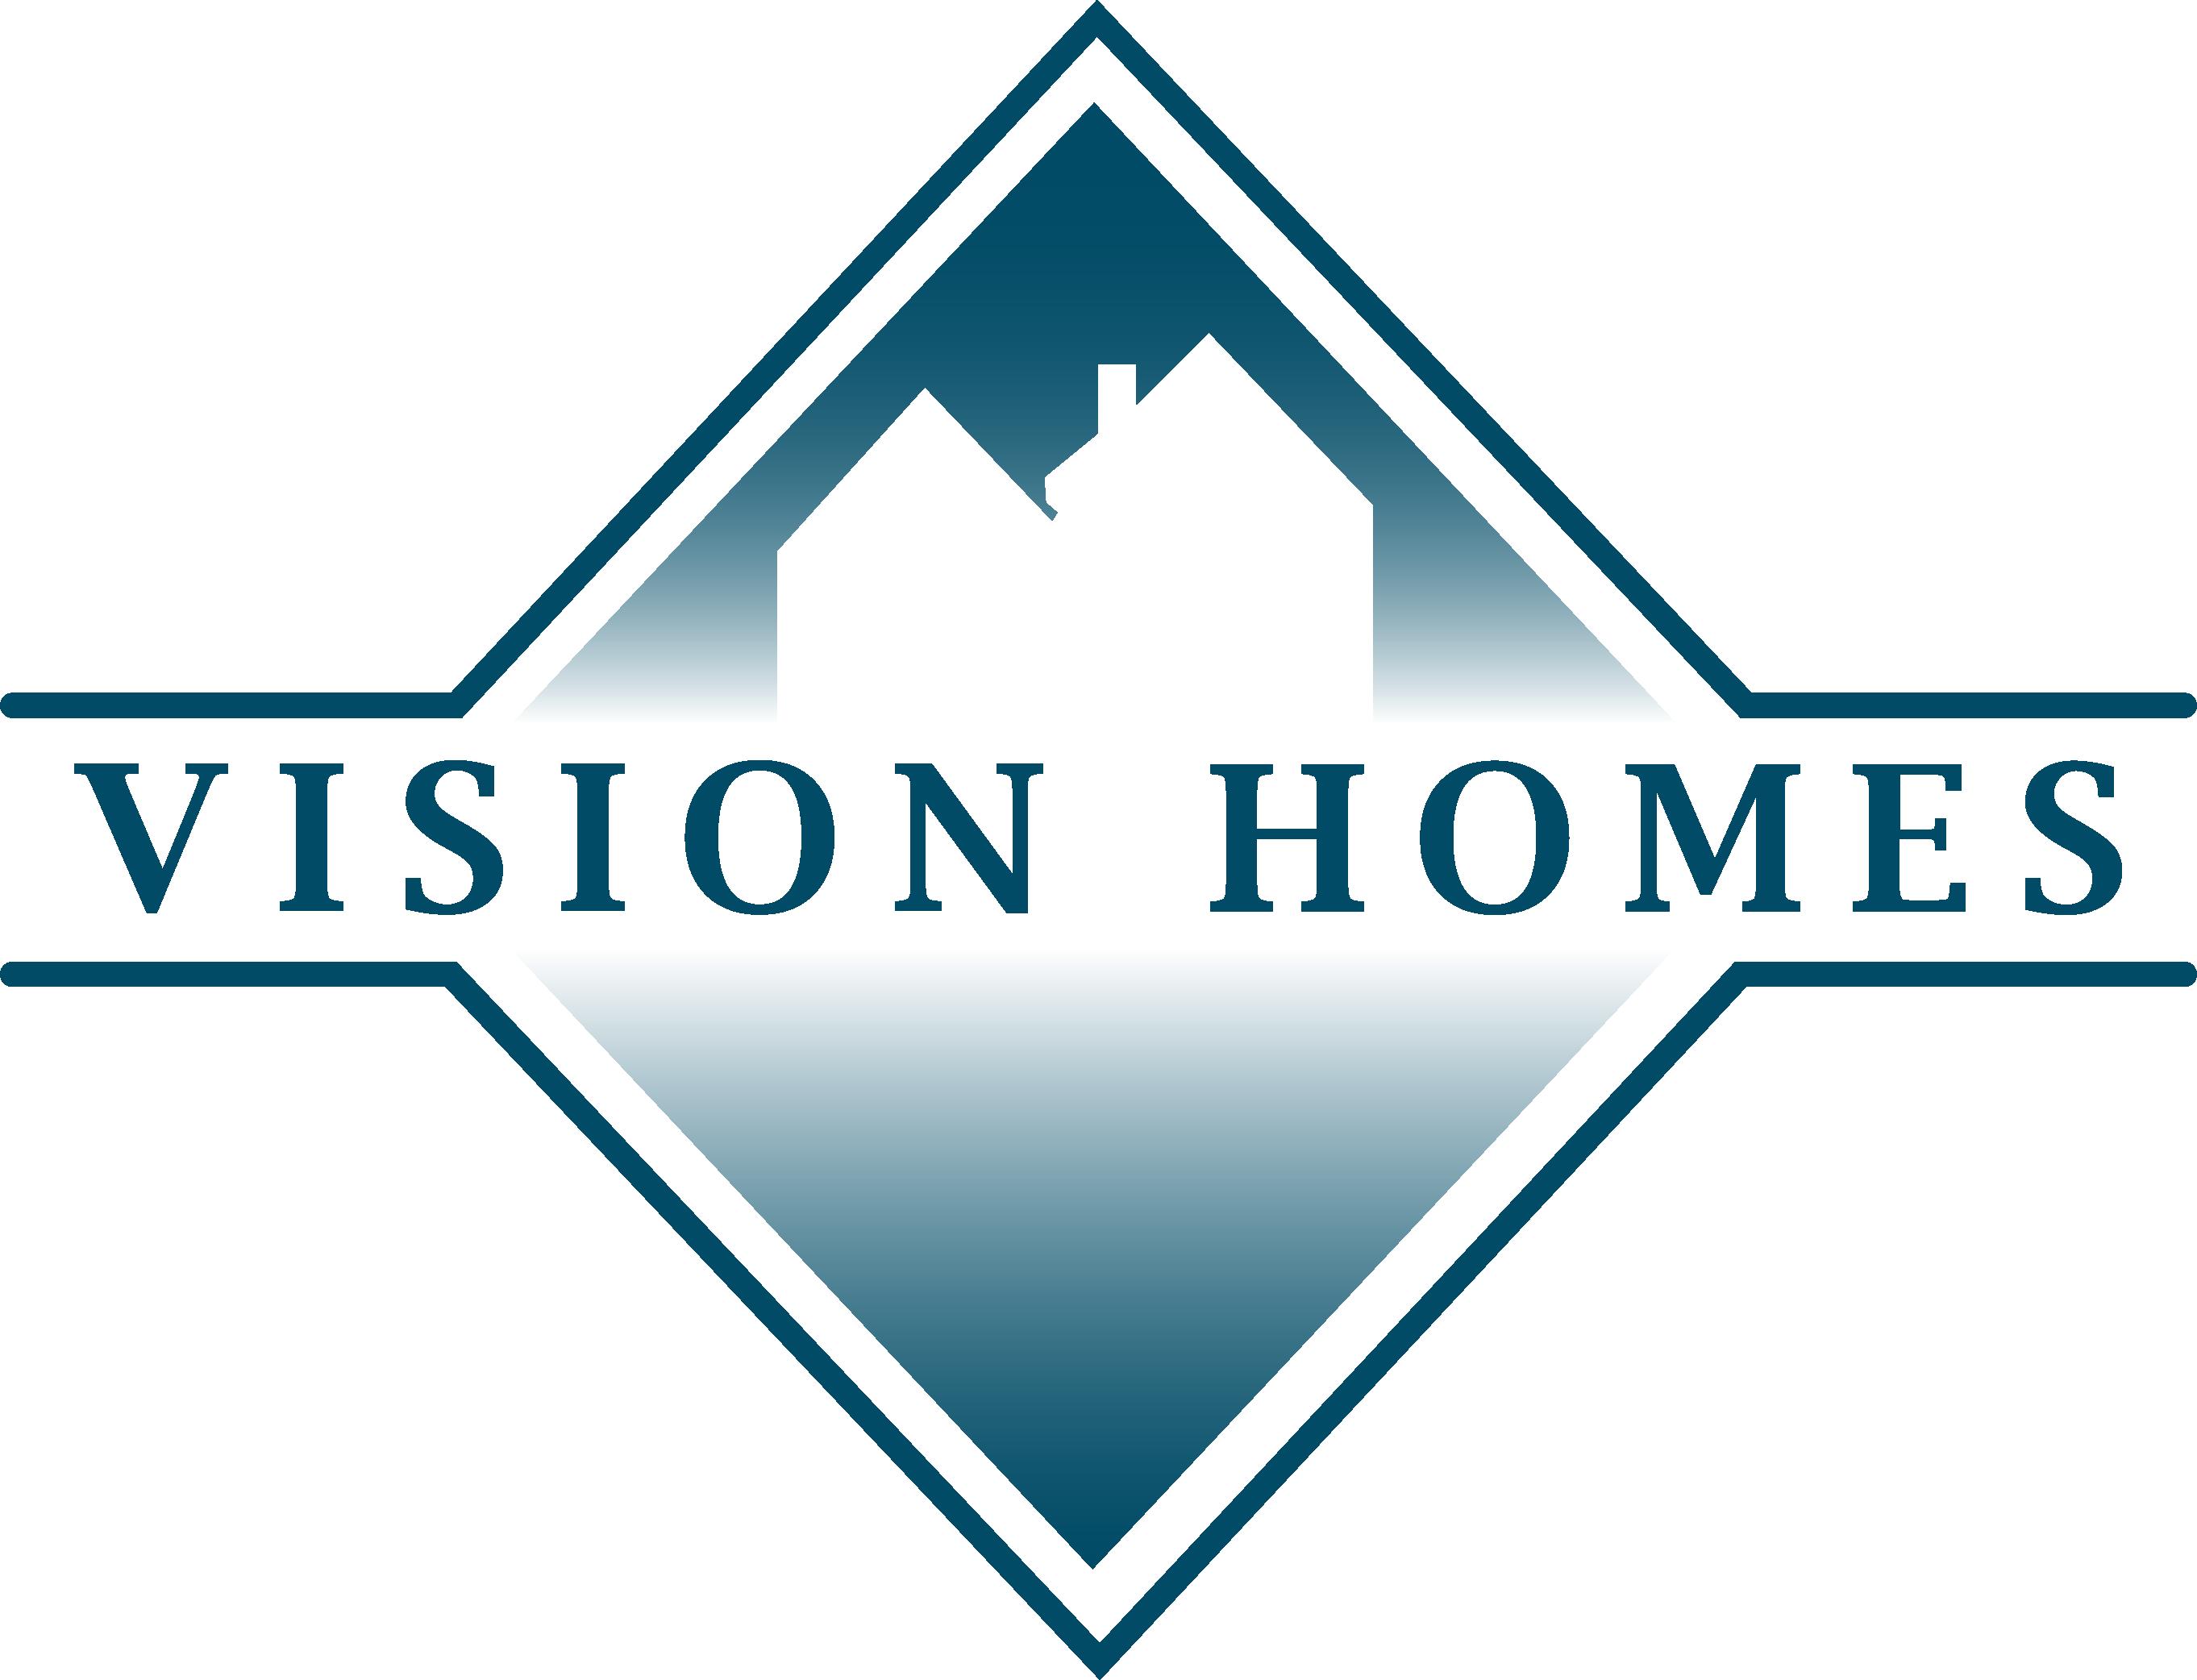 Vision-Homes-logo